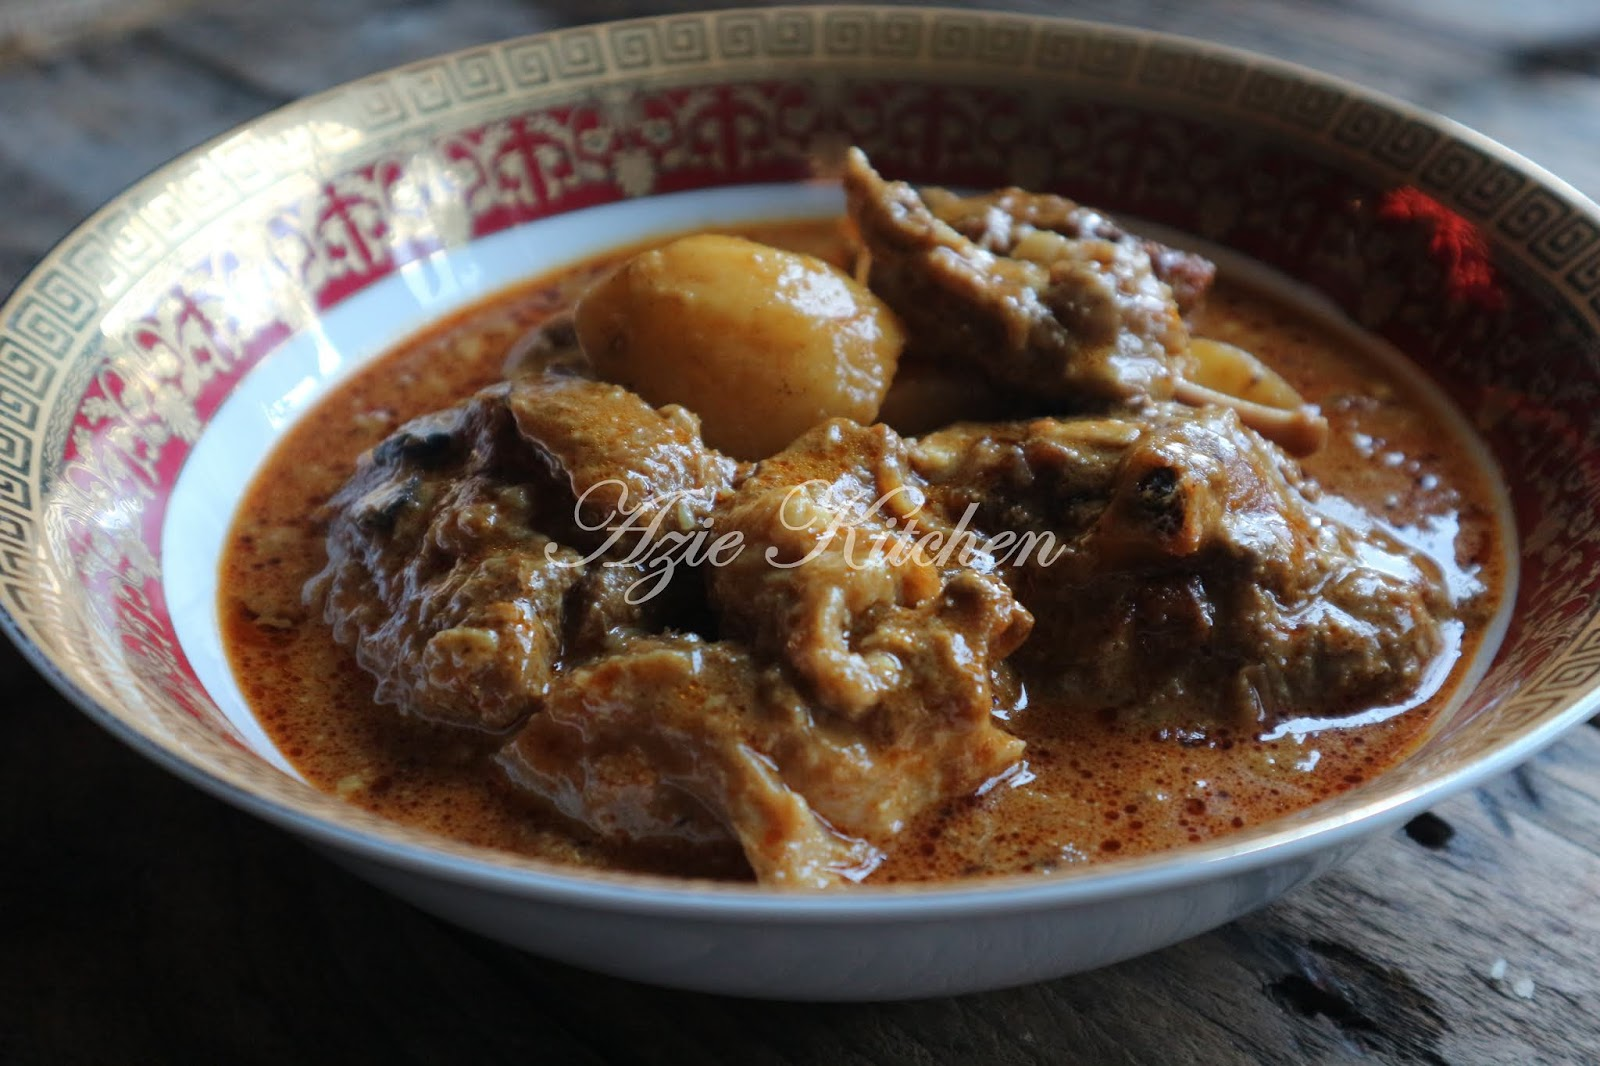 Kari Kambing Azie Kitchen